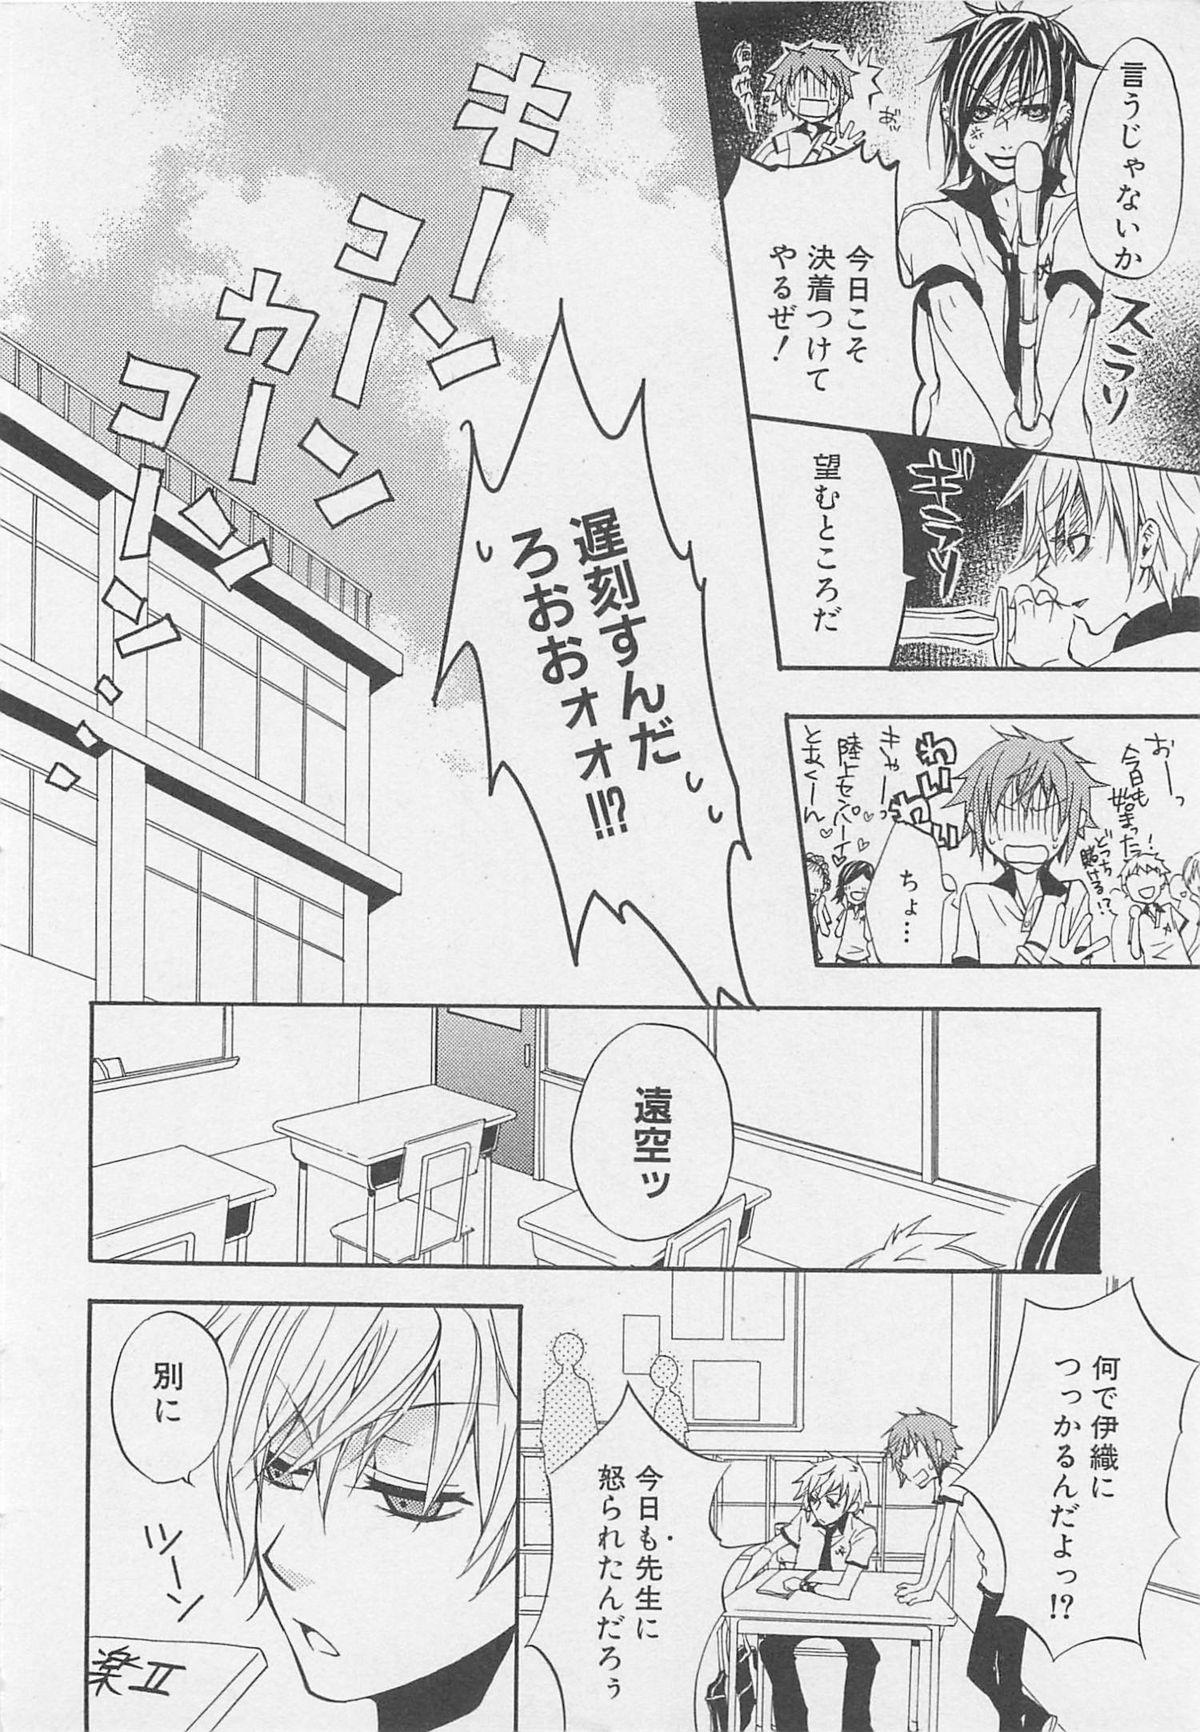 Shounentachi Vol. 2 18